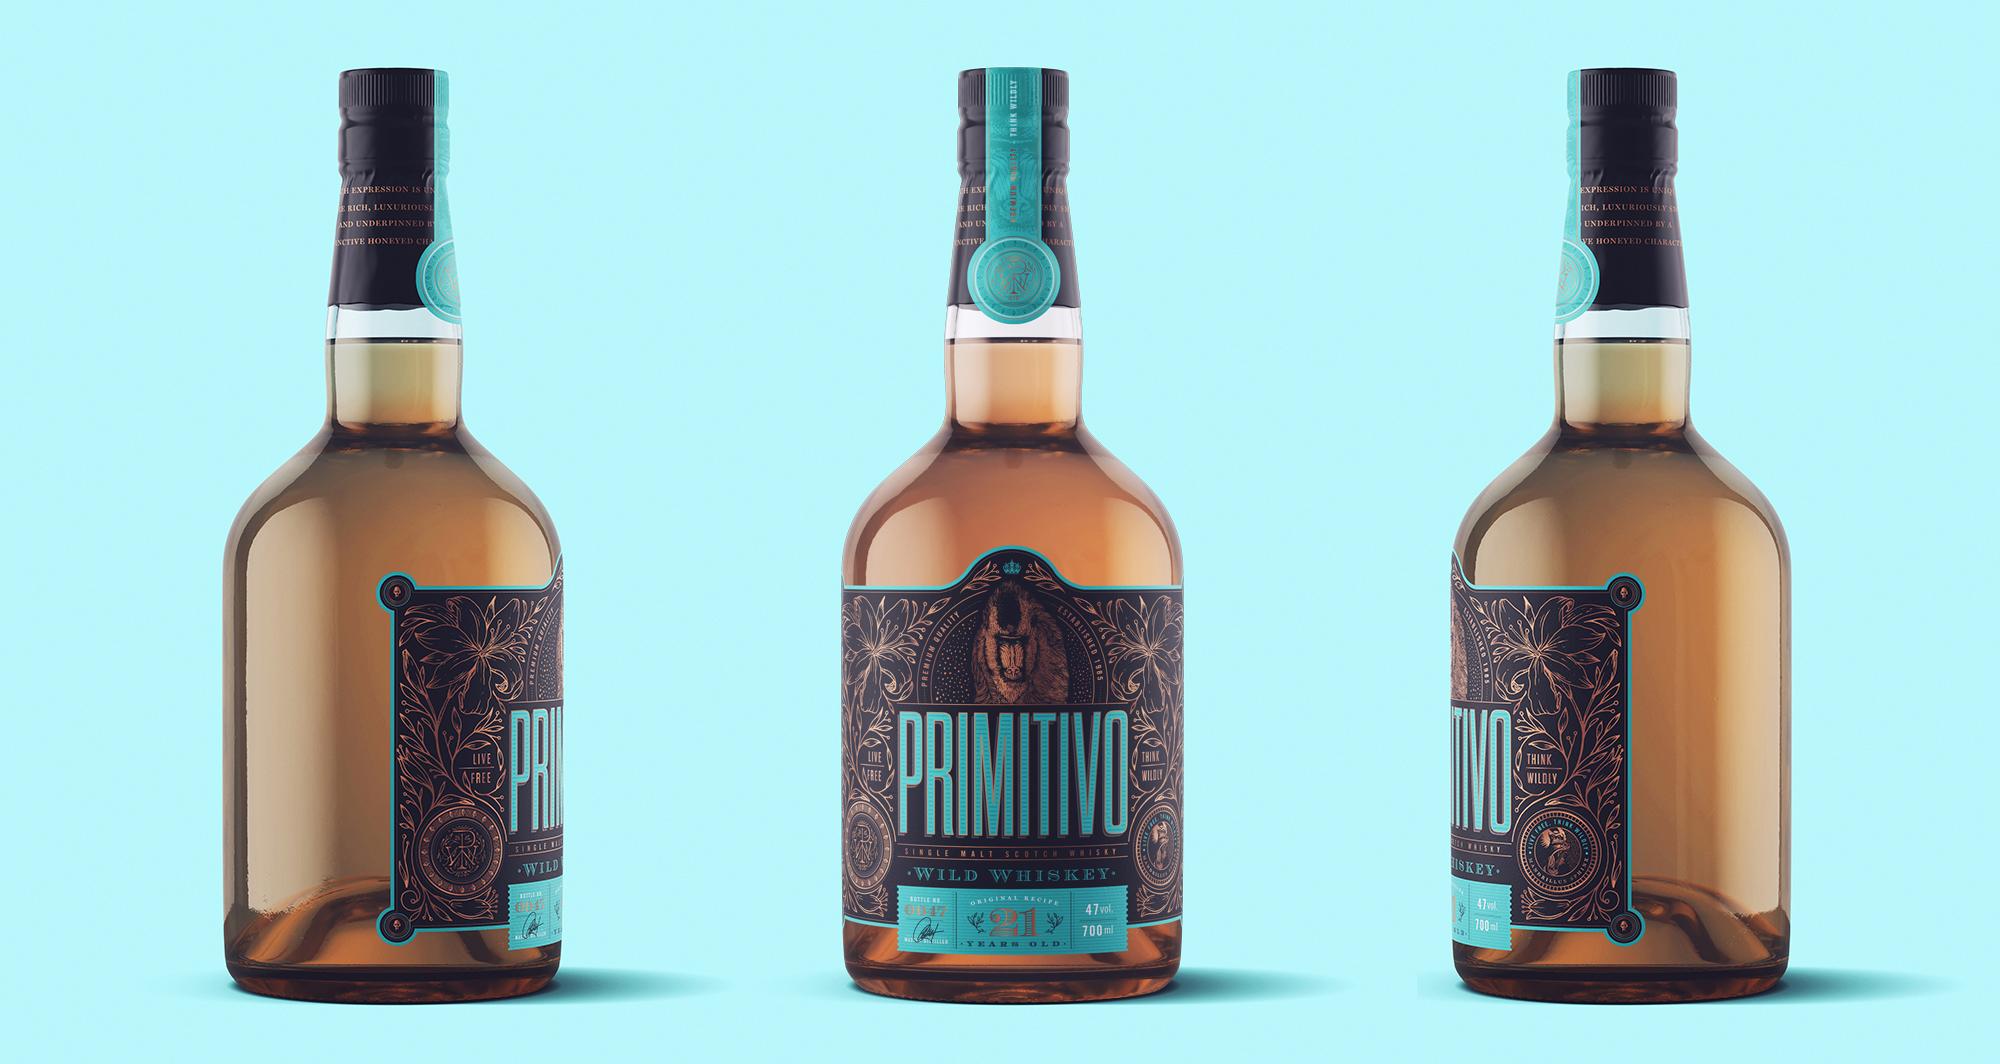 Emi Renzi Creates a Concept for Premium Scotch Whiskey